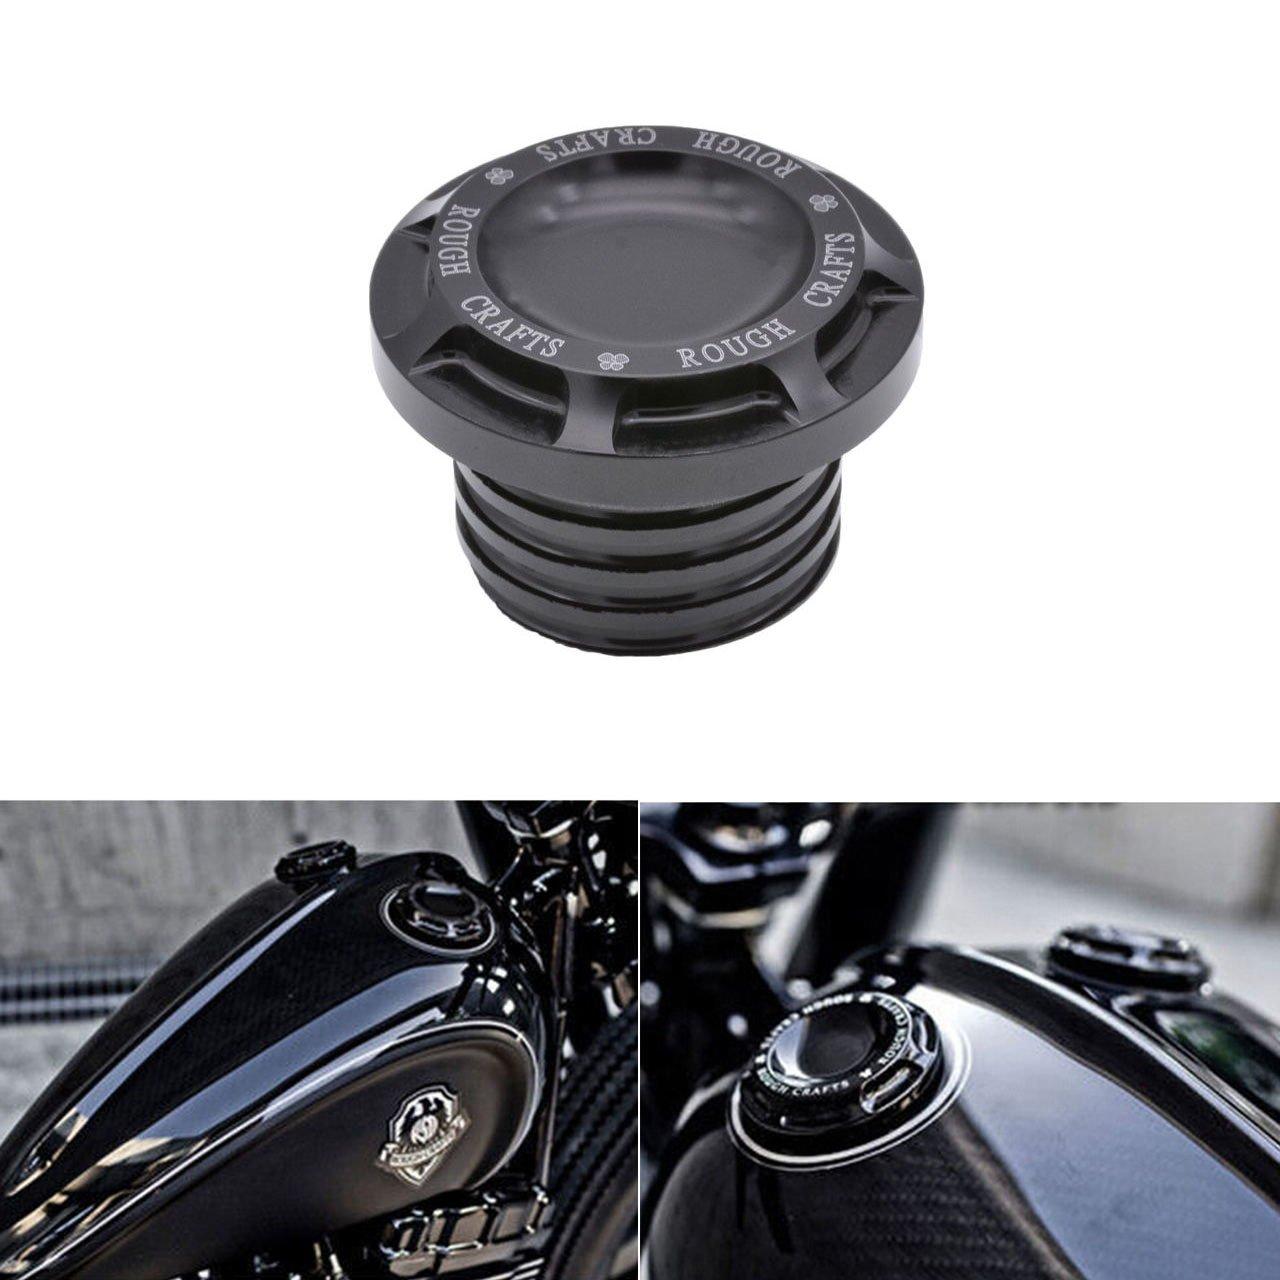 KaTur Motocicleta Negro CNC Rough Manualidades Aluminio Combustible Gas Aceite Cap para Harley Sportster XL 1200/883/1996/ /2014